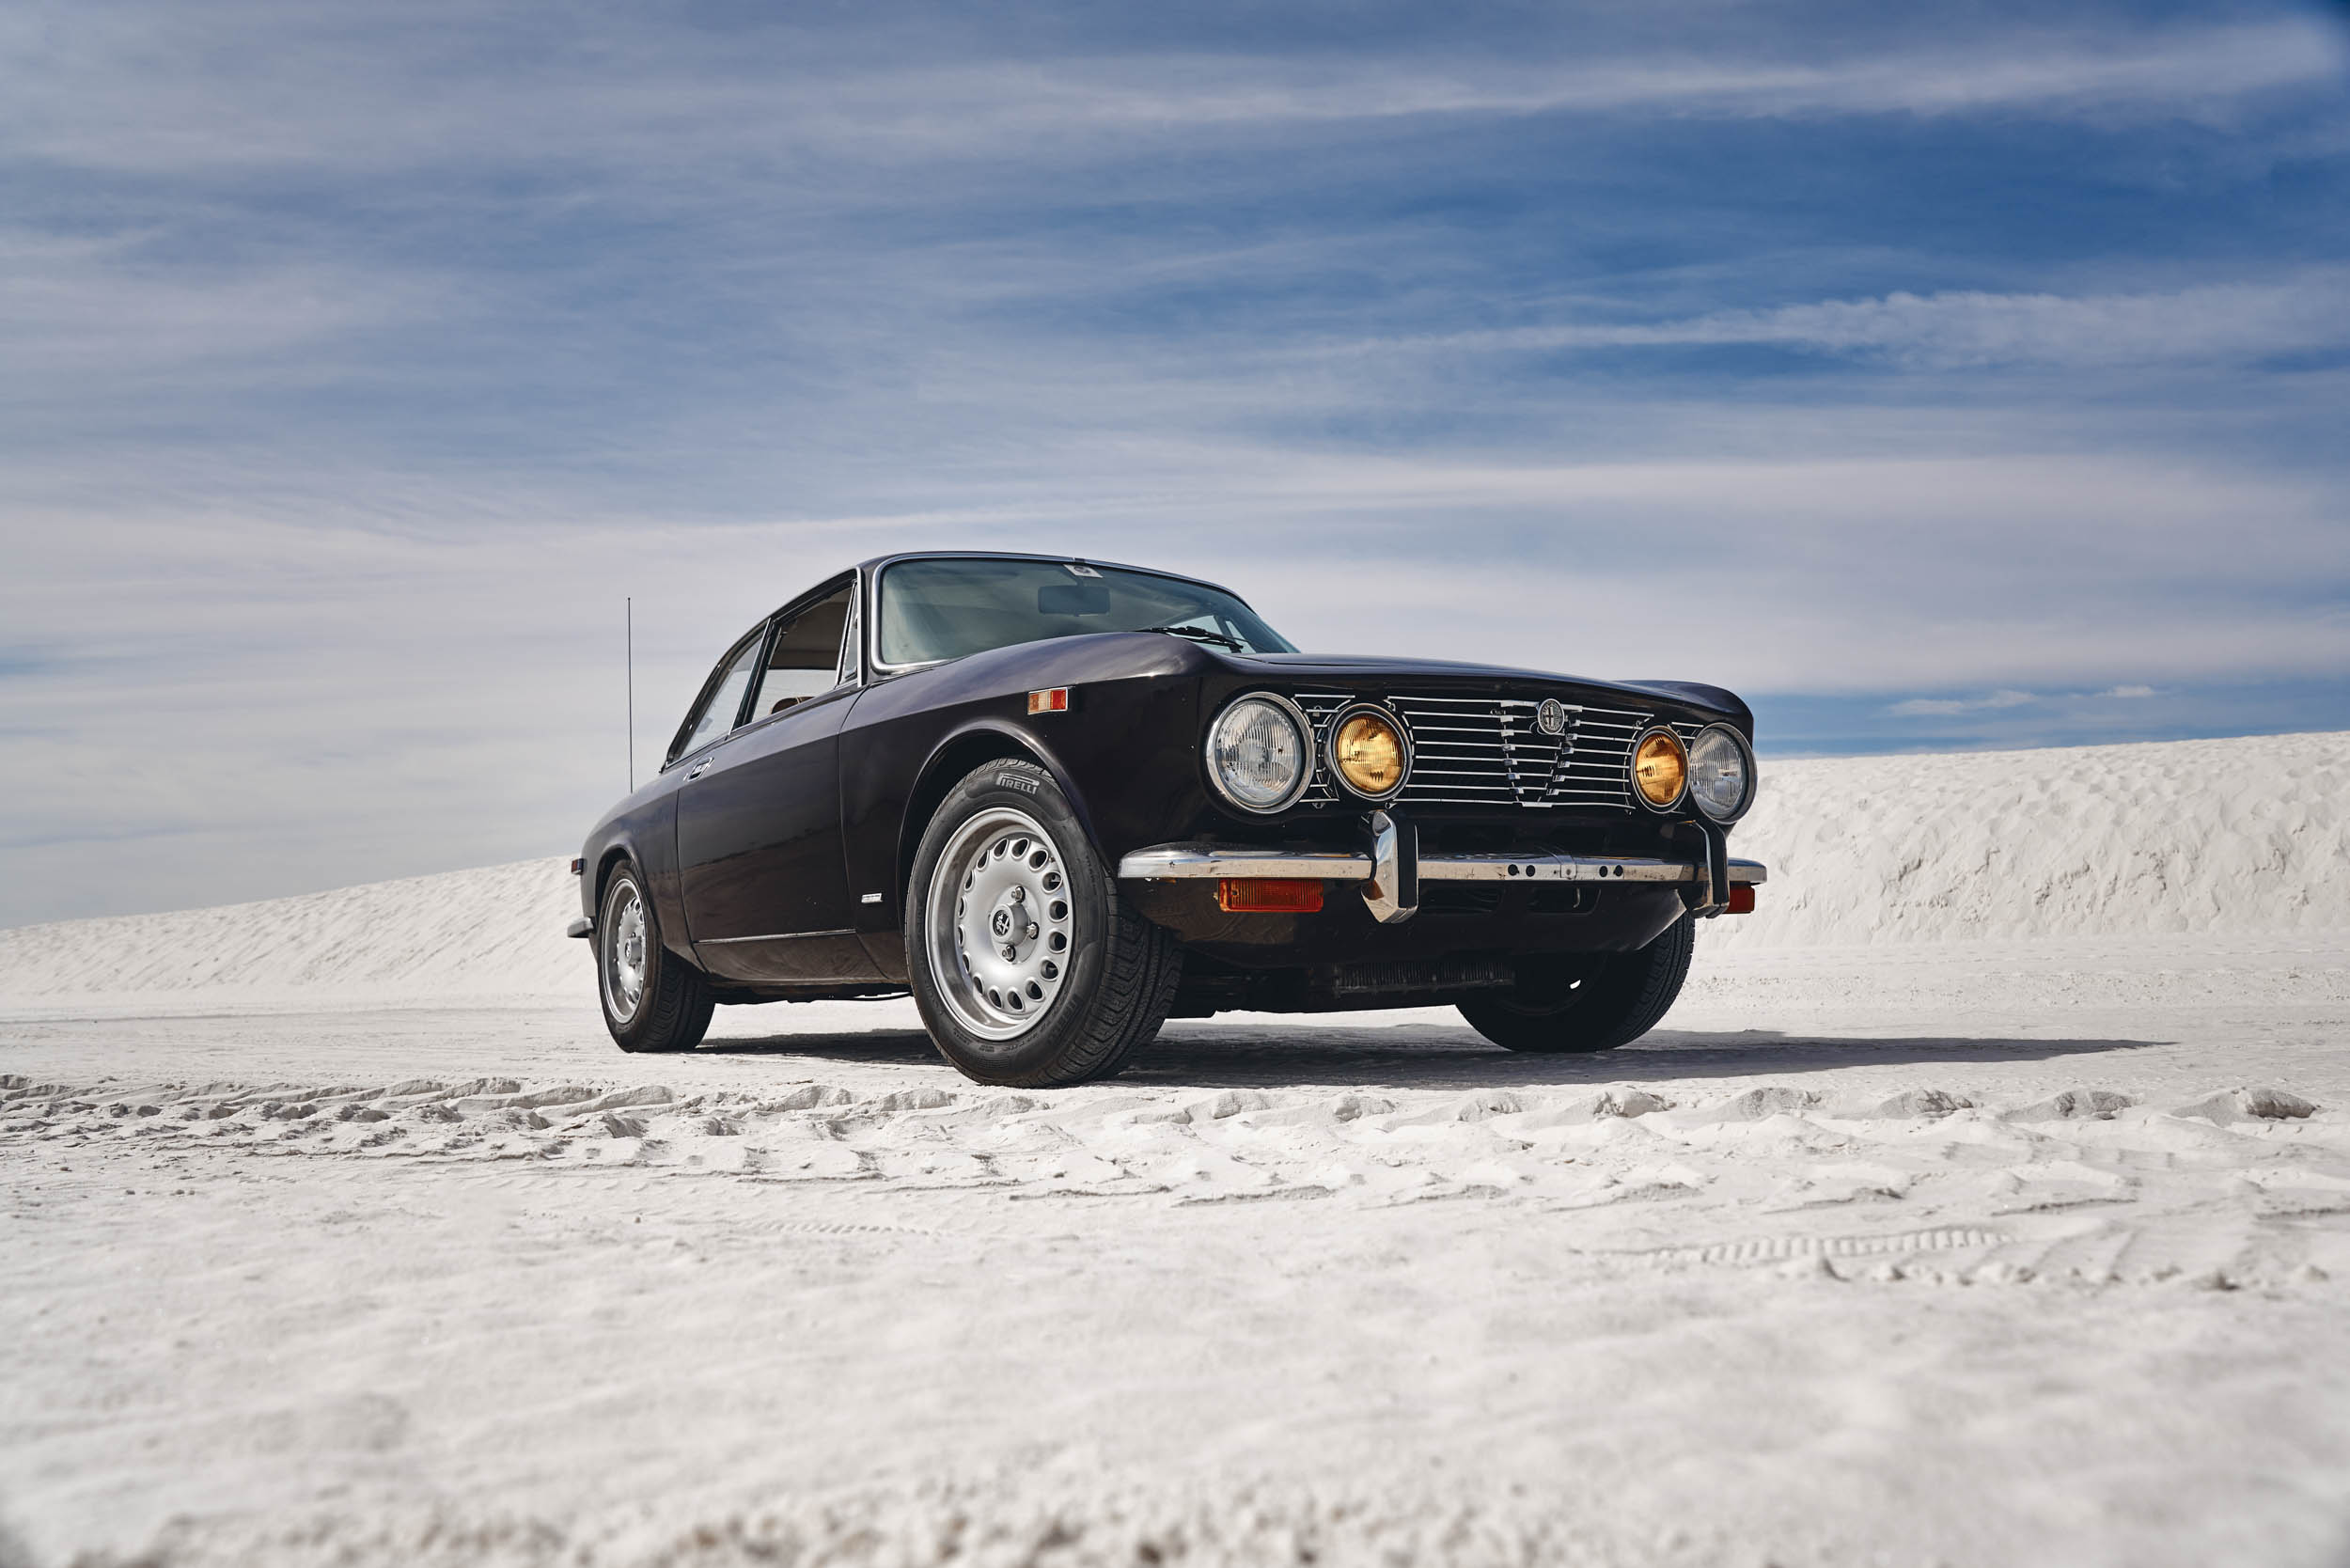 Alfa Romeo GTV low front 3/4 in the desert